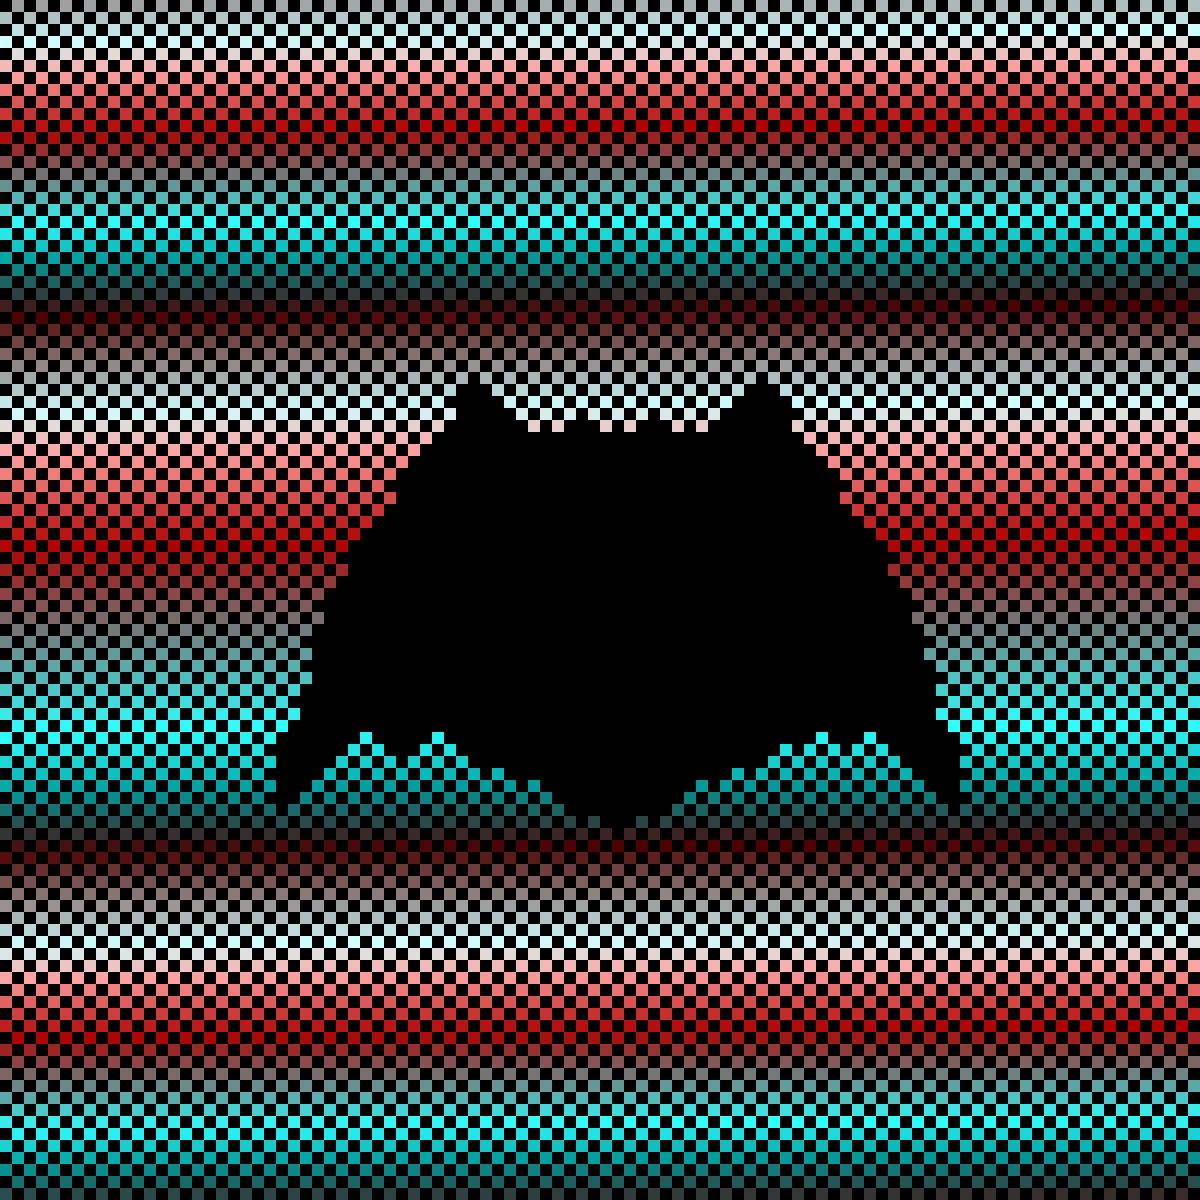 Bat man dawn of justice logo by VicD267